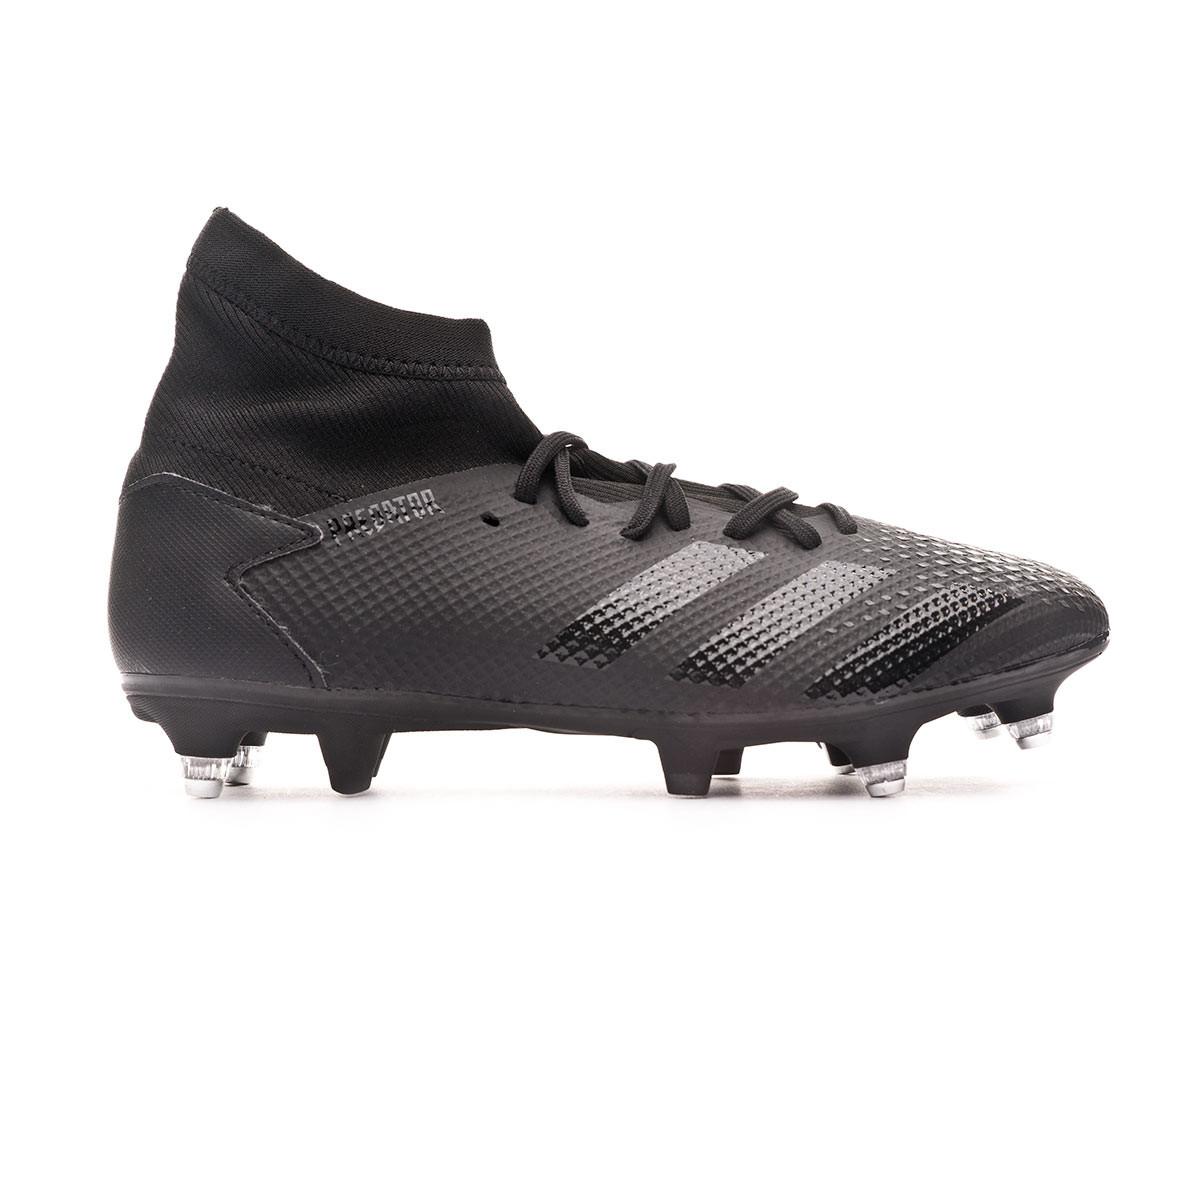 Chaussure de foot adidas Predator 20.3 SG